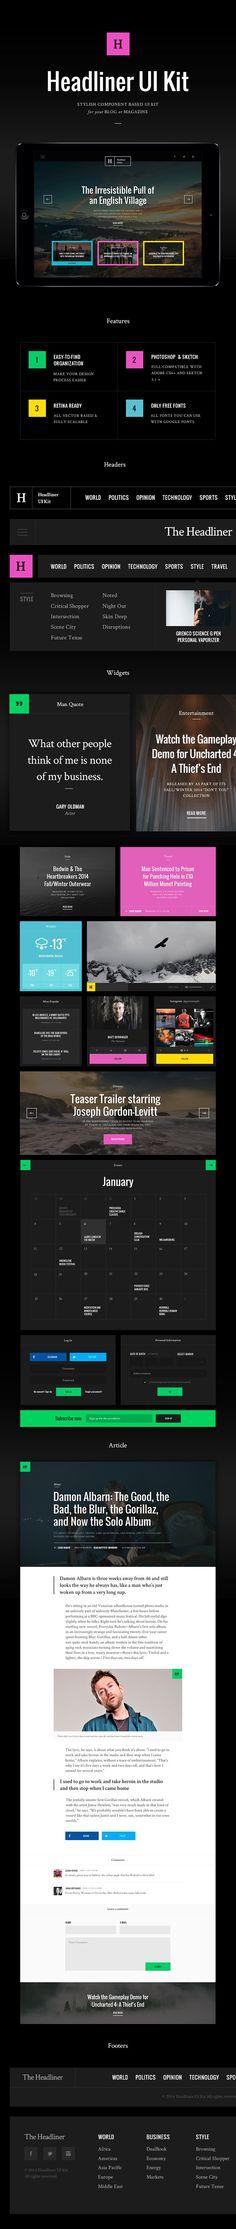 Headliner UI Kit by Great Simple on @creativemarket